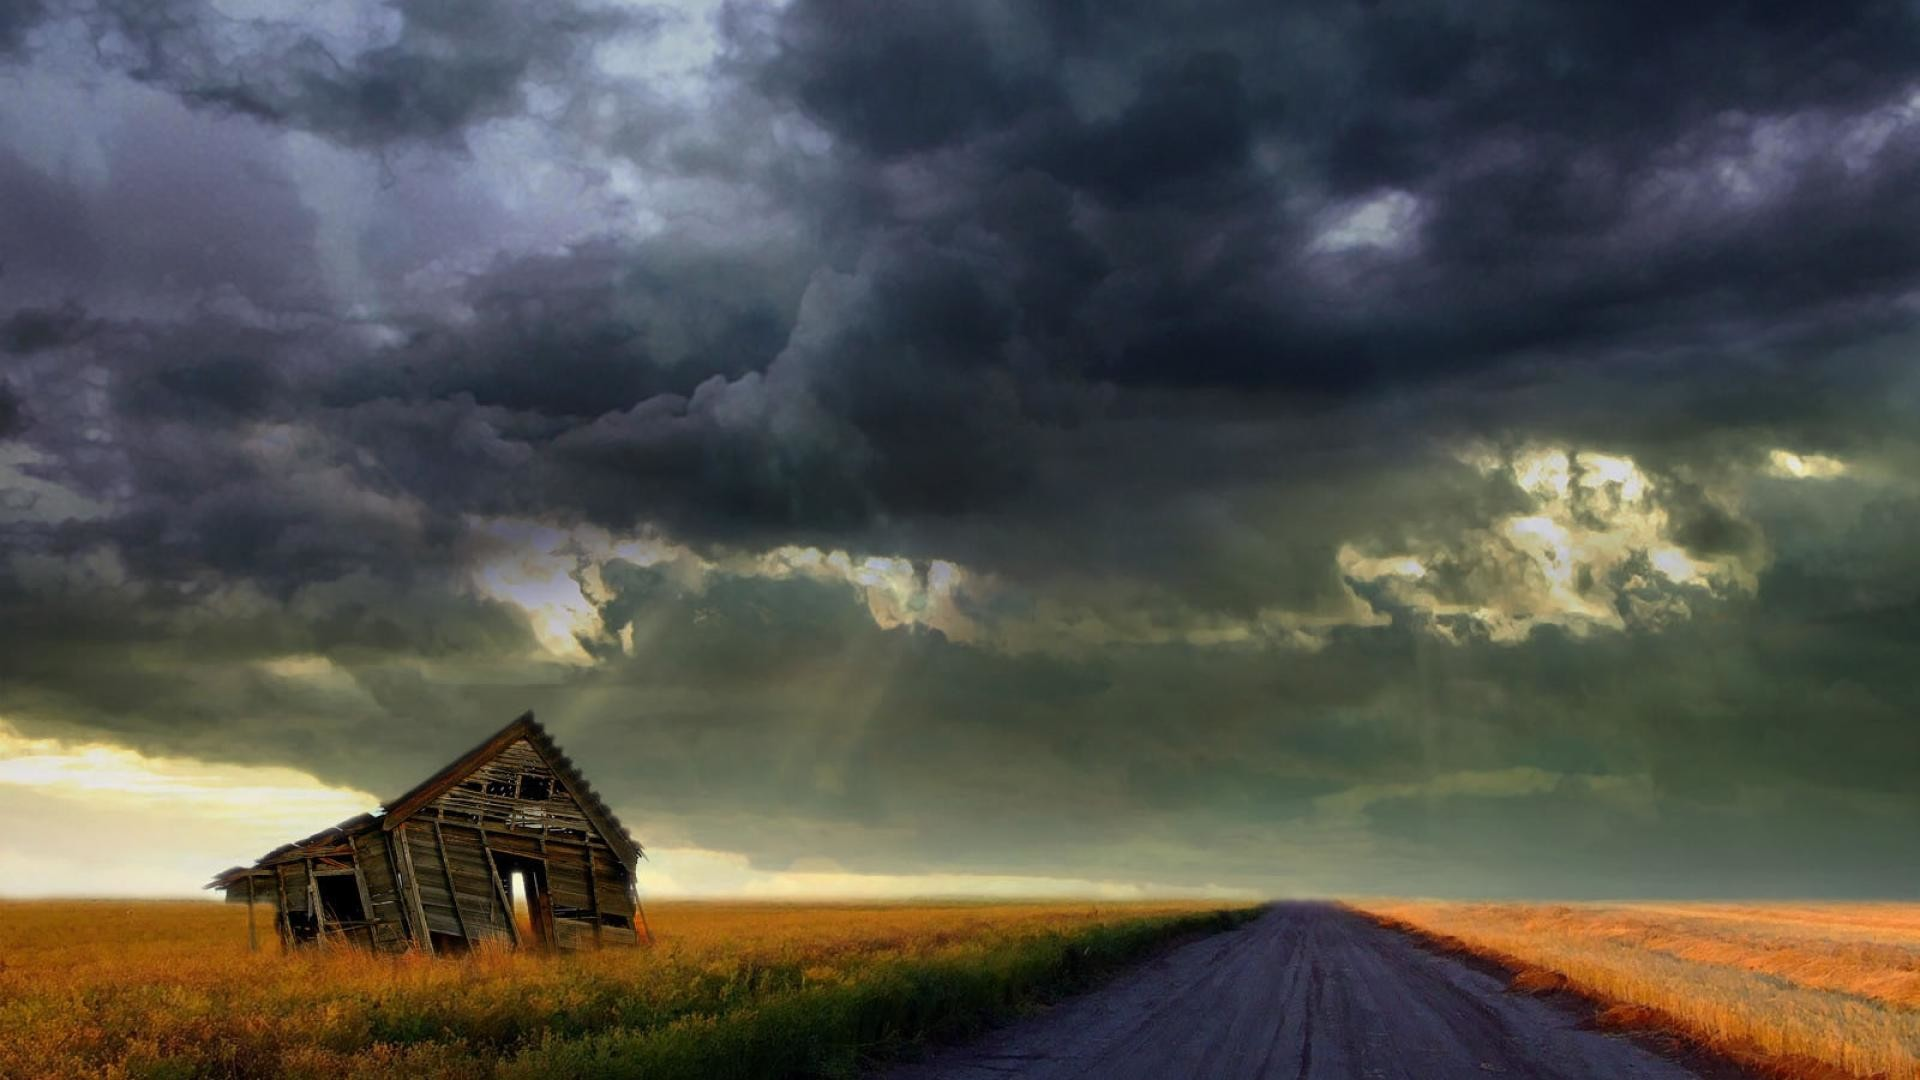 Storm Desktop Wallpapers – Wallpaper, High Definition, High Quality .